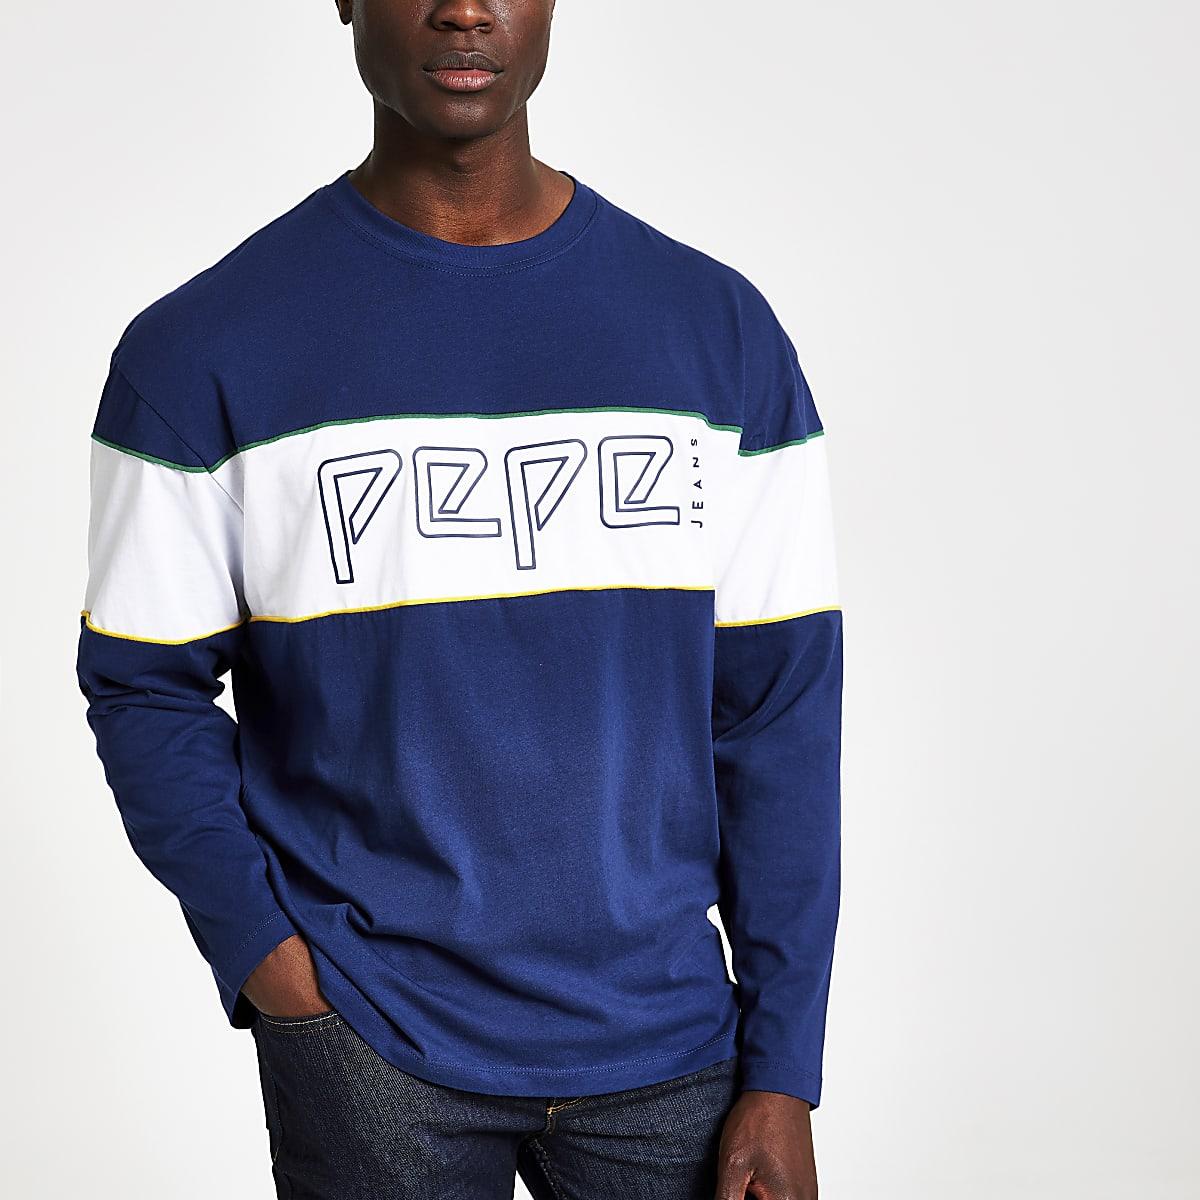 Pepe Jeans blue logo sweatshirt